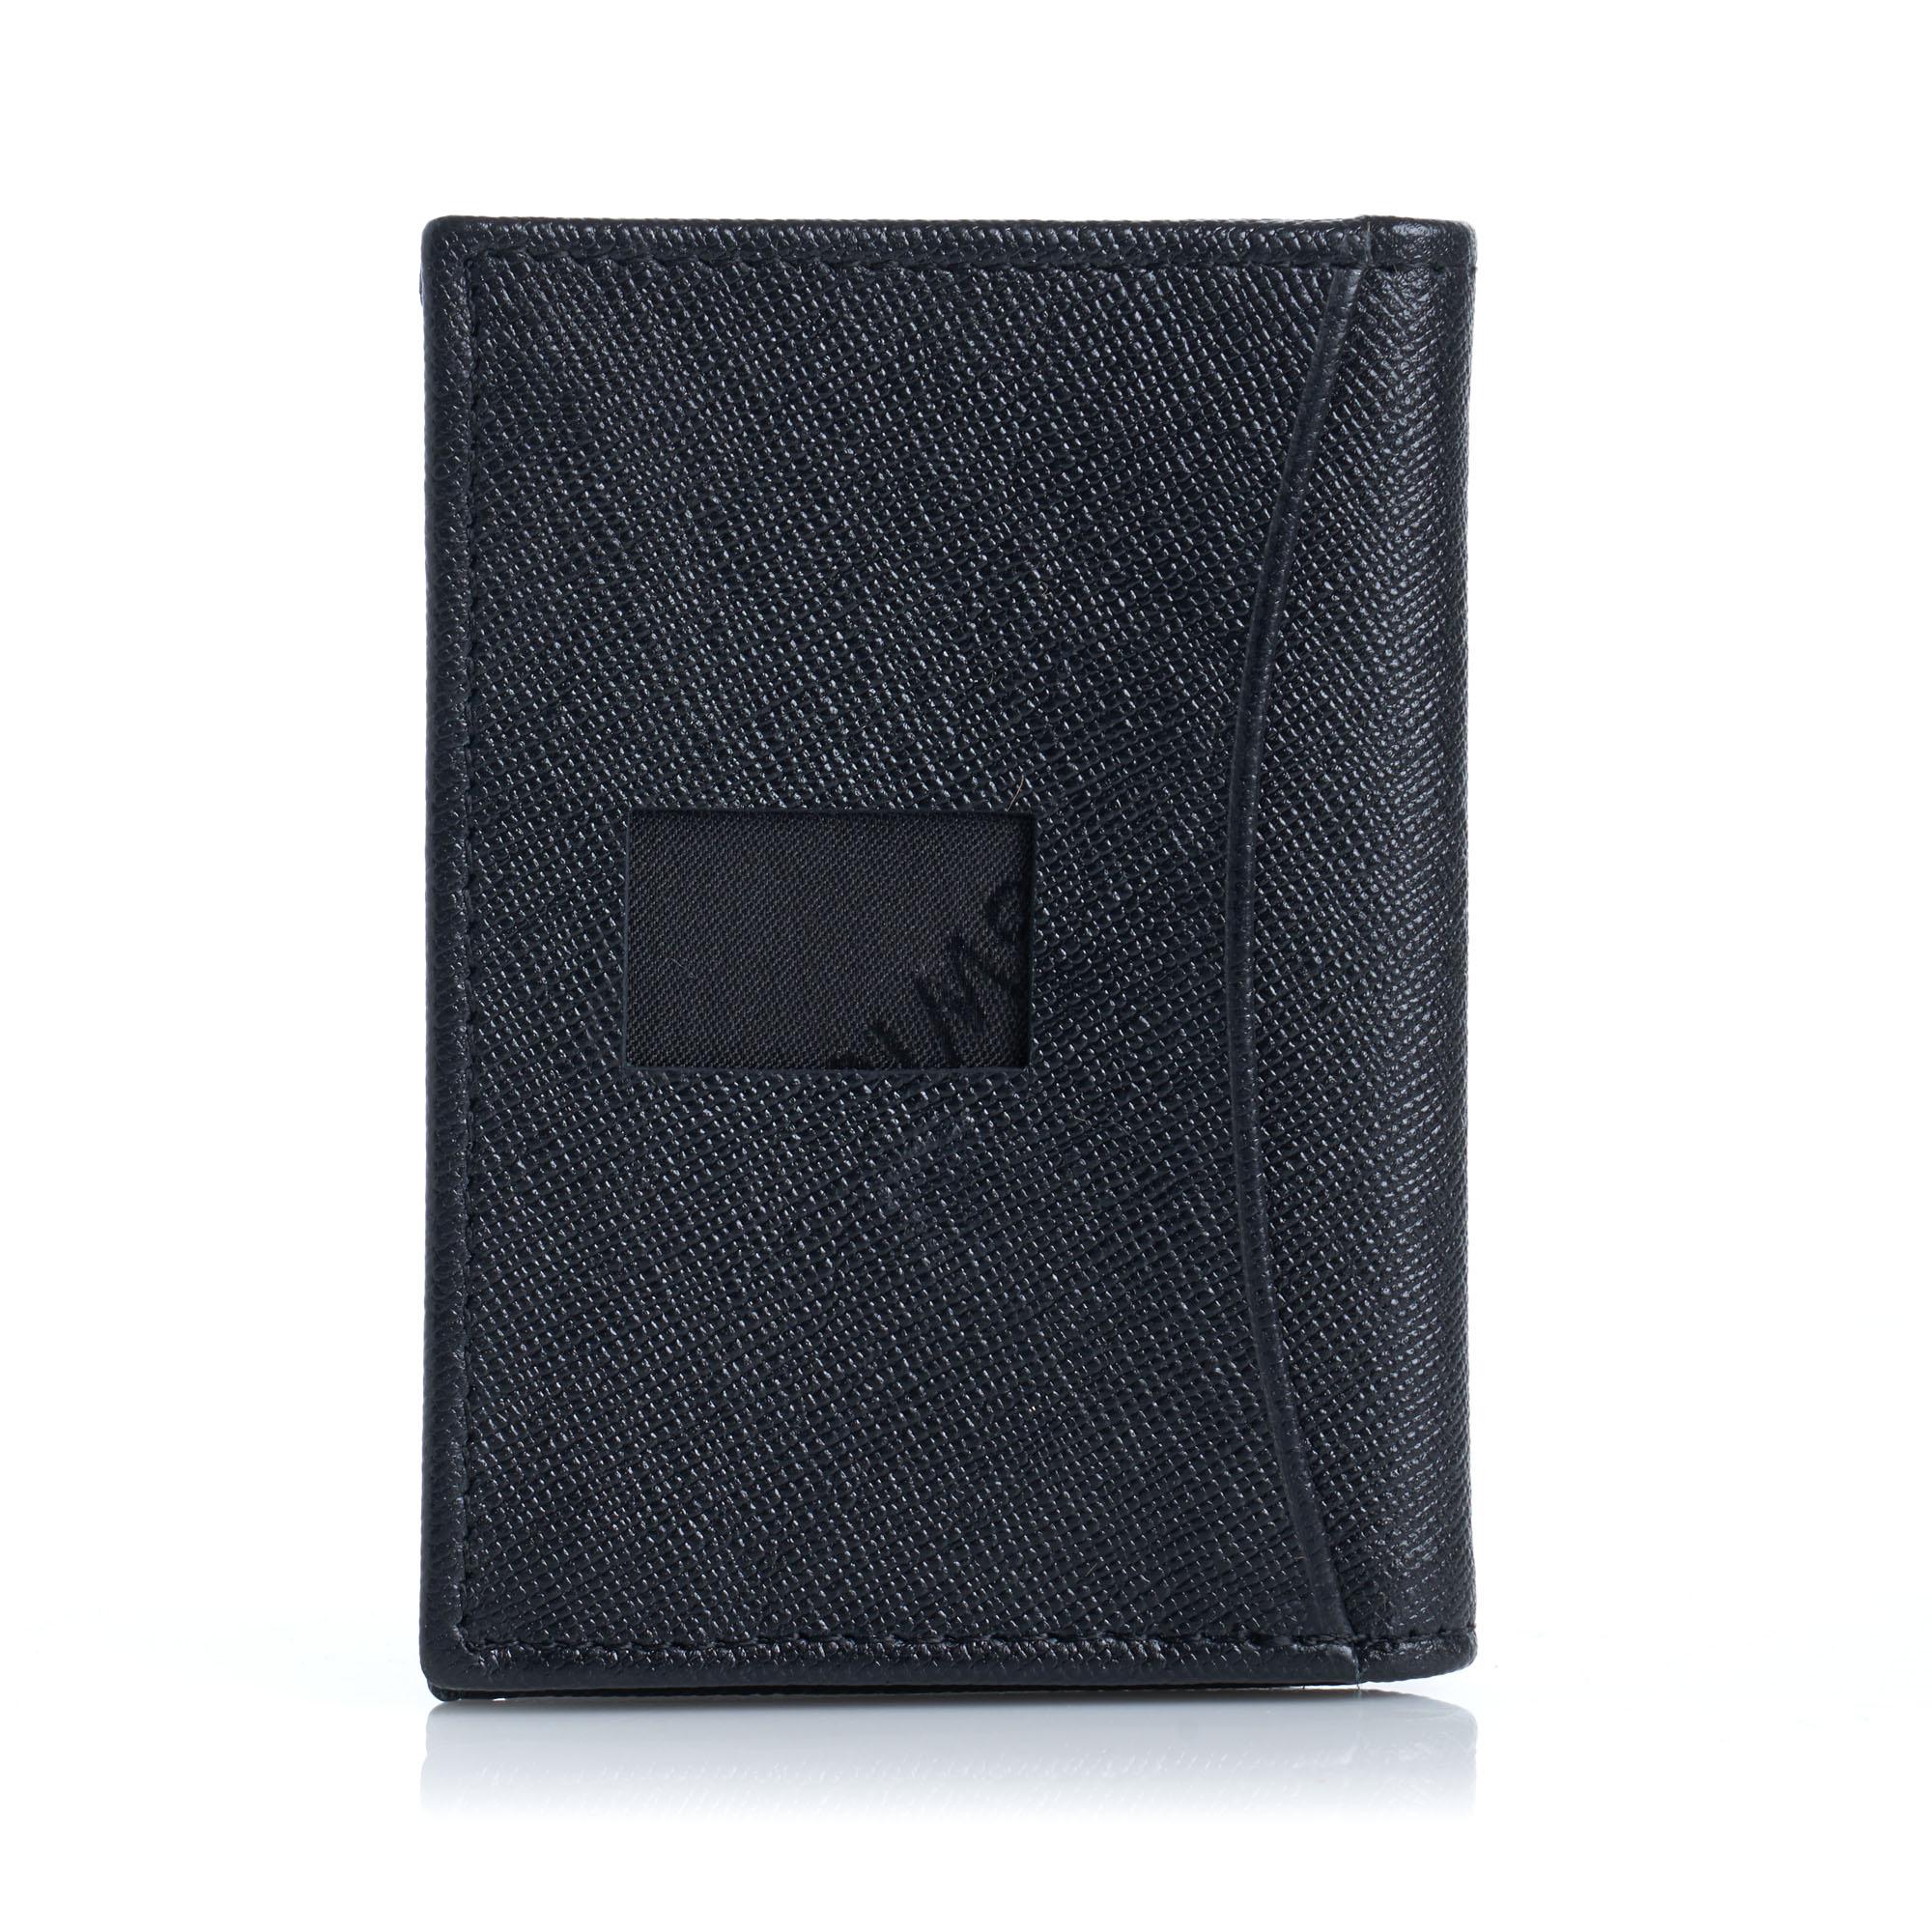 Alpine-Swiss-RFID-Leather-Business-Card-Wallet-Minimalist-ID-Window-Card-Holder thumbnail 32